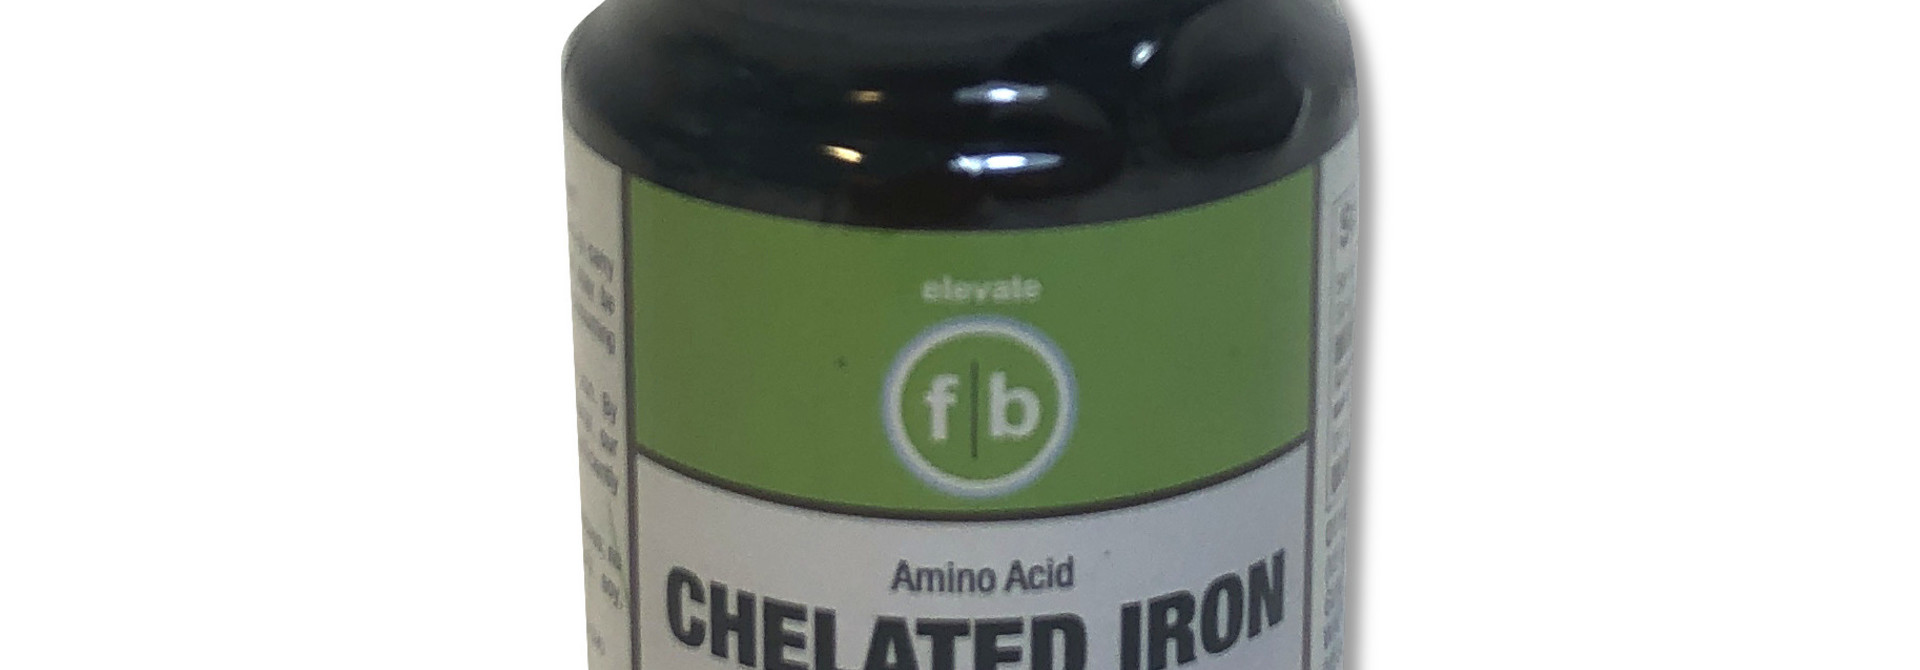 Chelated Iron 29mg